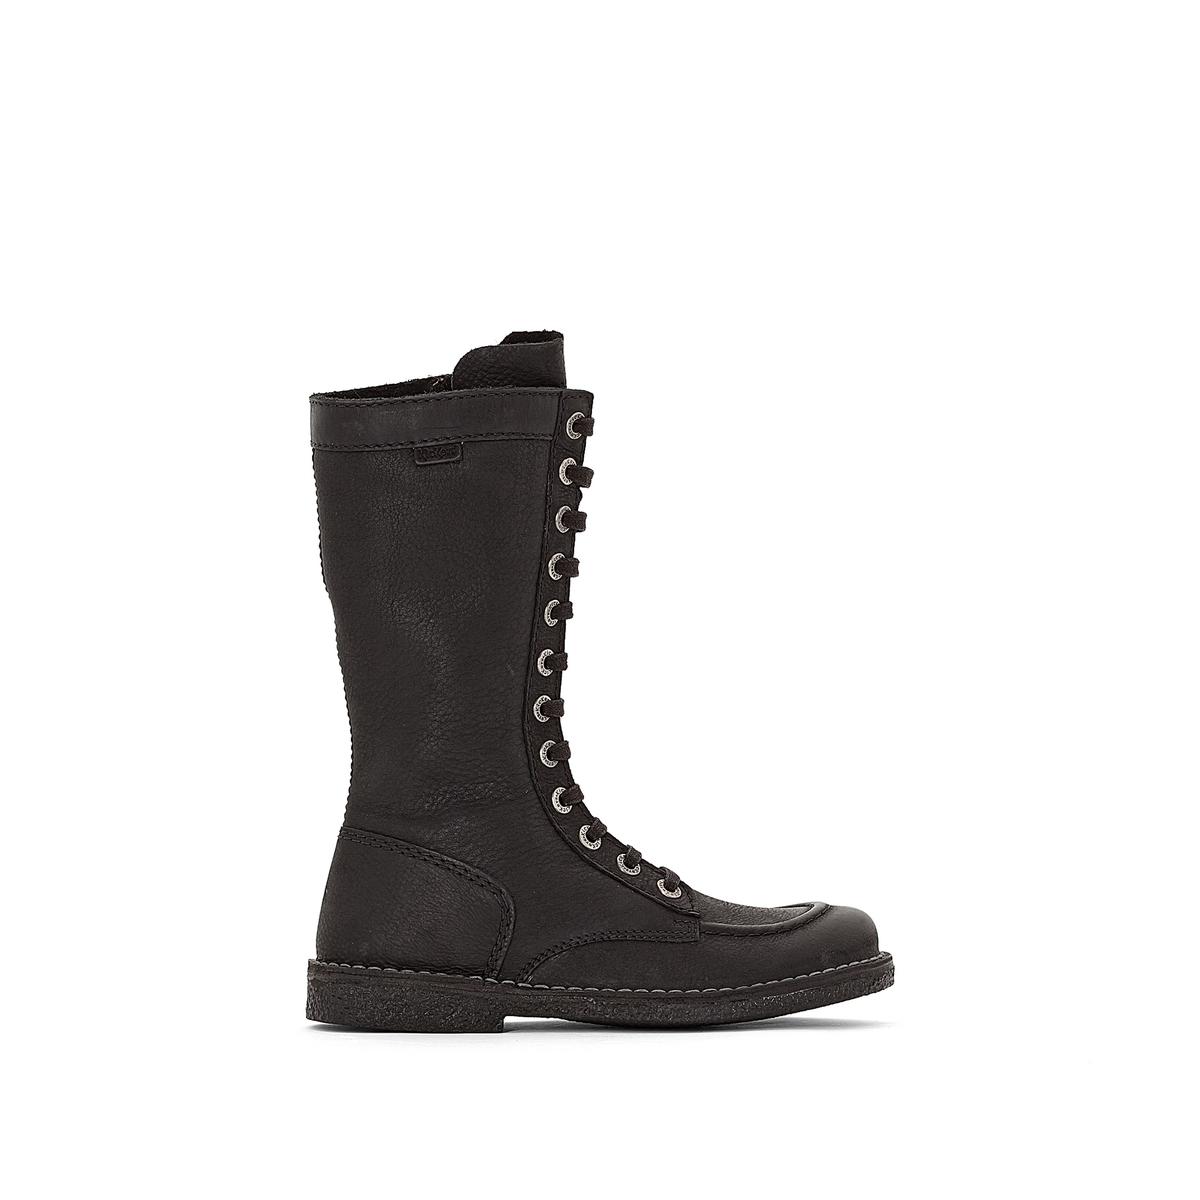 Ботинки кожаные на шнуровке, MEETKIKNE